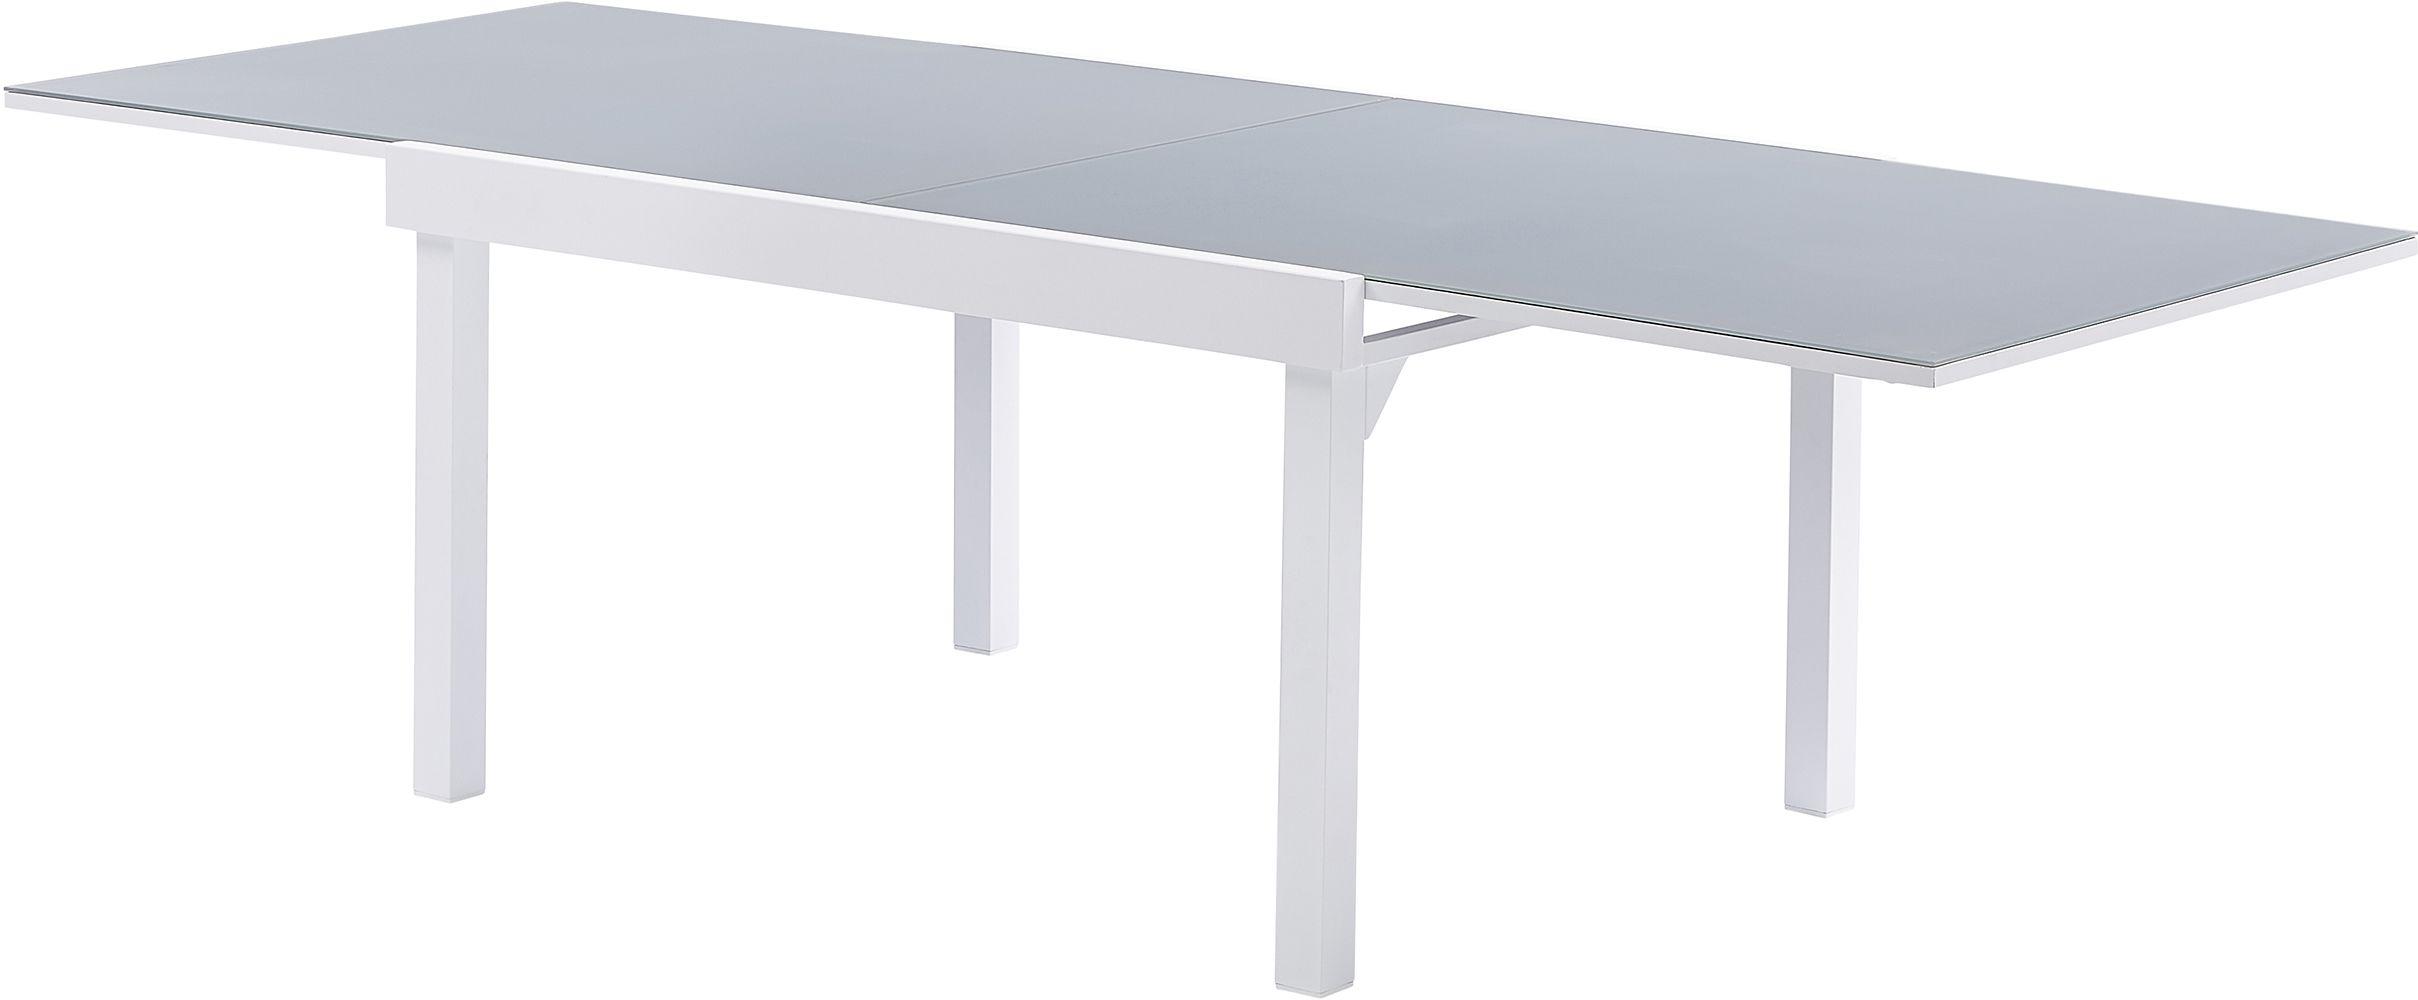 Salon de jardin moderne 10 personnes modulo blanc - Table jardin foire fouille fort de france ...